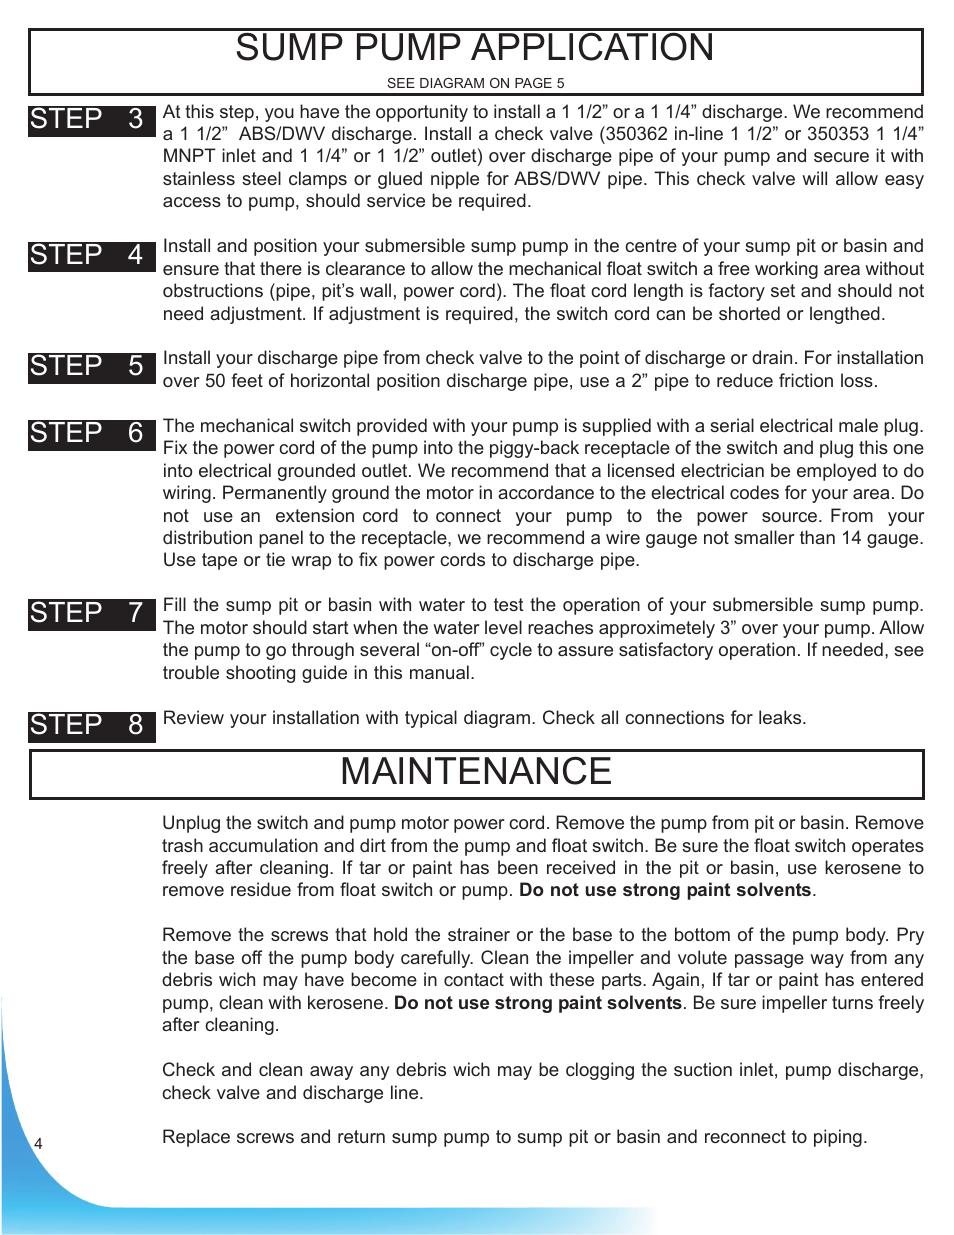 Maintenance Sump Pump Application Burcam 300608 Cast Iron Subm Float Switch Wiring Mechanical 1 3hp 115v User Manual Page 4 6